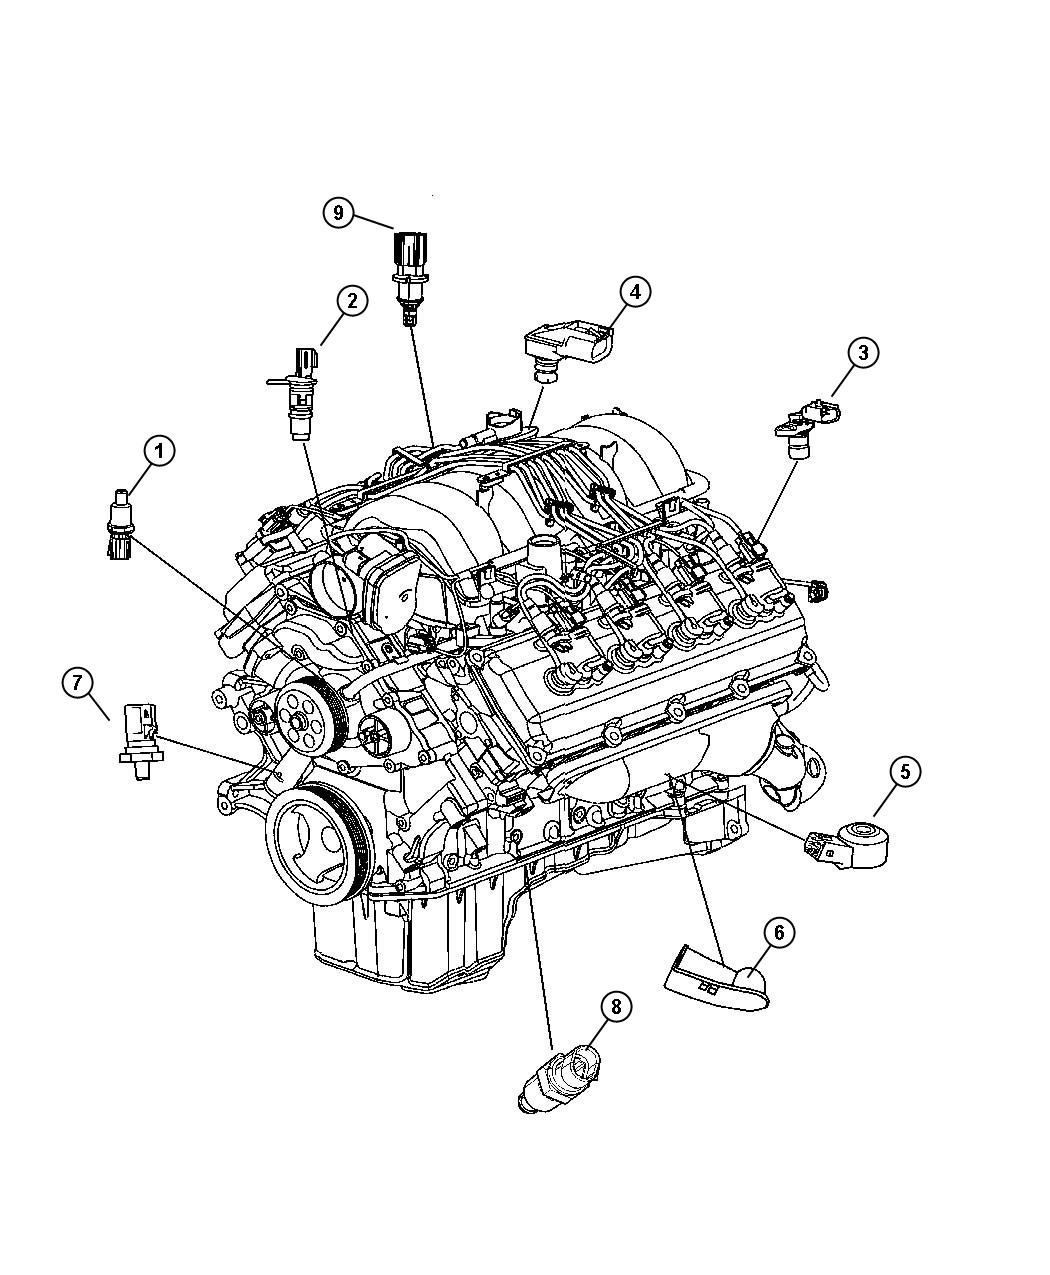 2008 Jeep Grand Cherokee Sending Unit  Oil Pressure